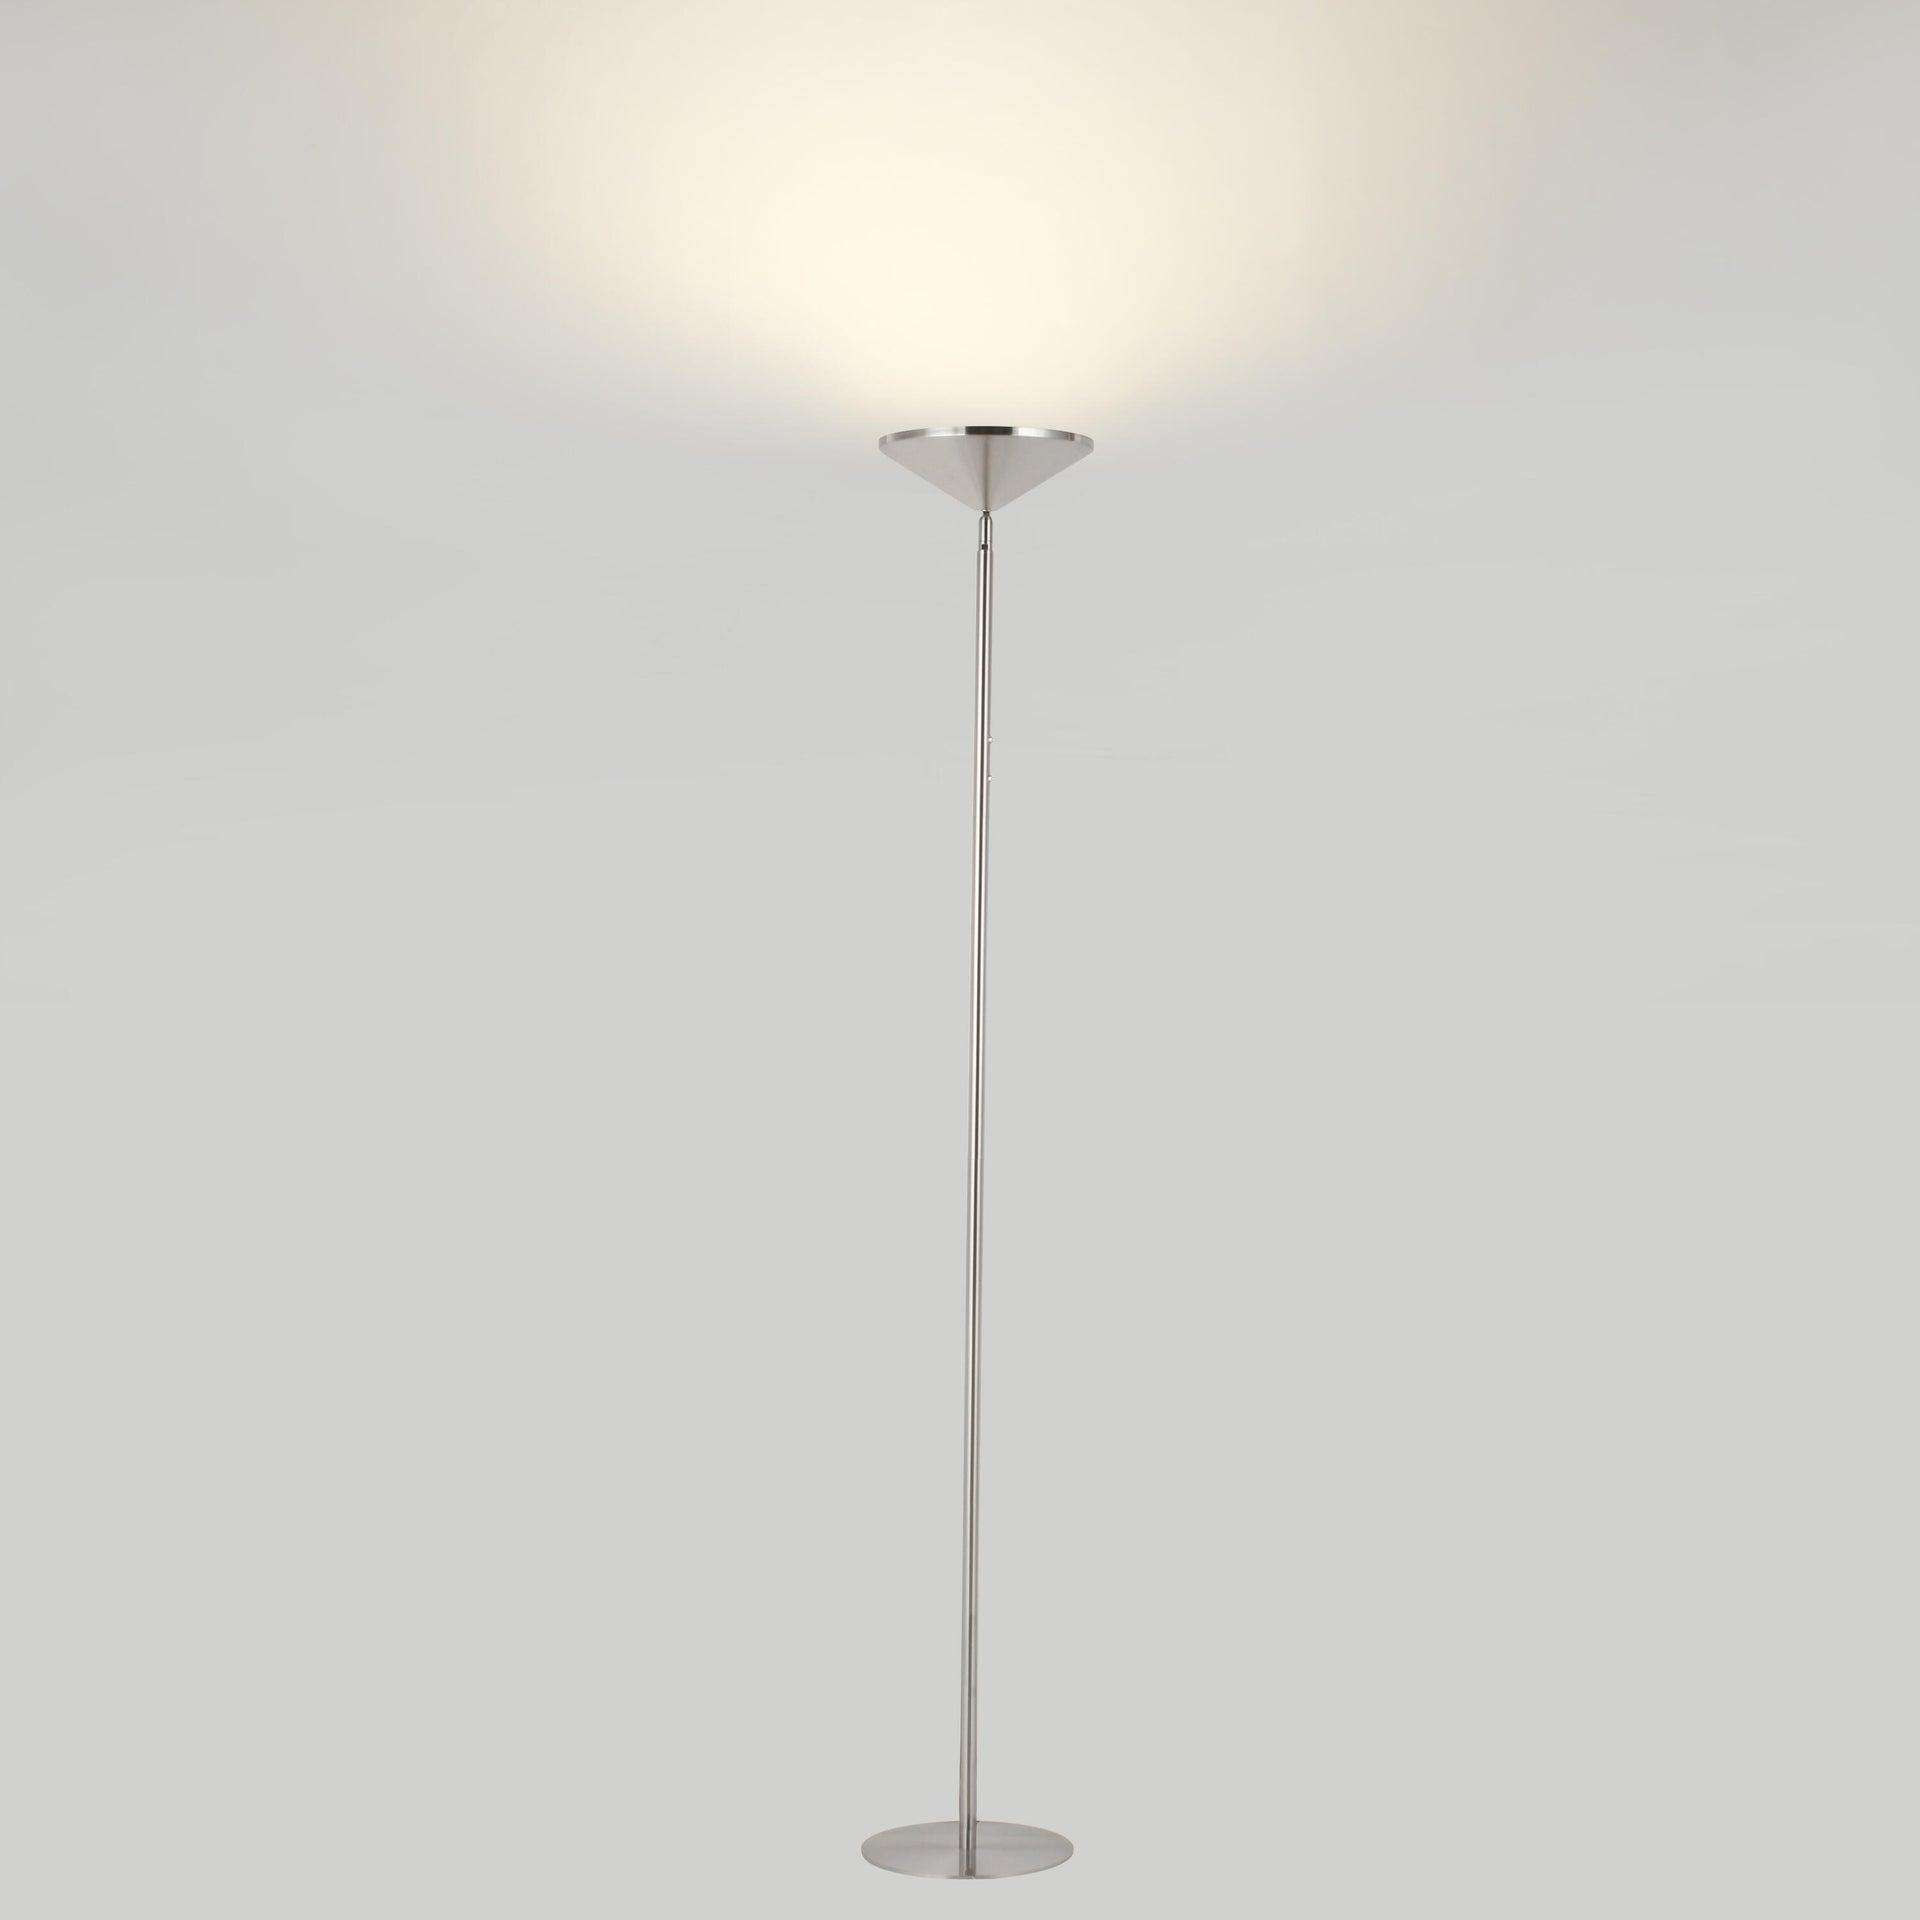 Lampada da terra Sauki grigio, in metallo, H180cm LED integrato INSPIRE - 4